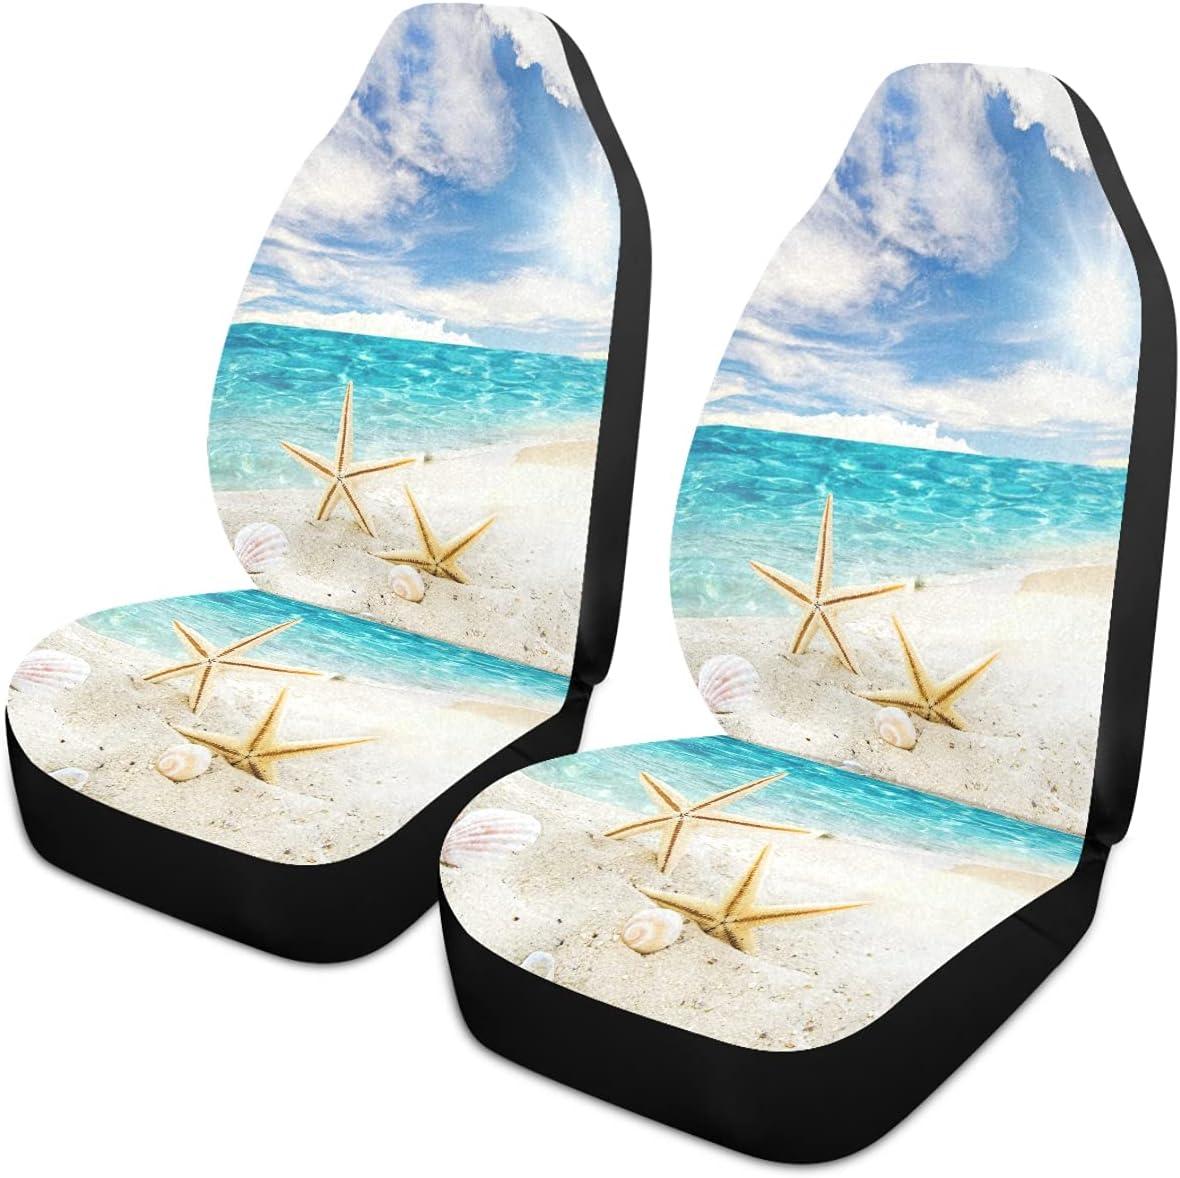 Oarencol Starfish Seashell Beach Max 53% OFF Long-awaited Sandy Car Blue Covers Sky Seat